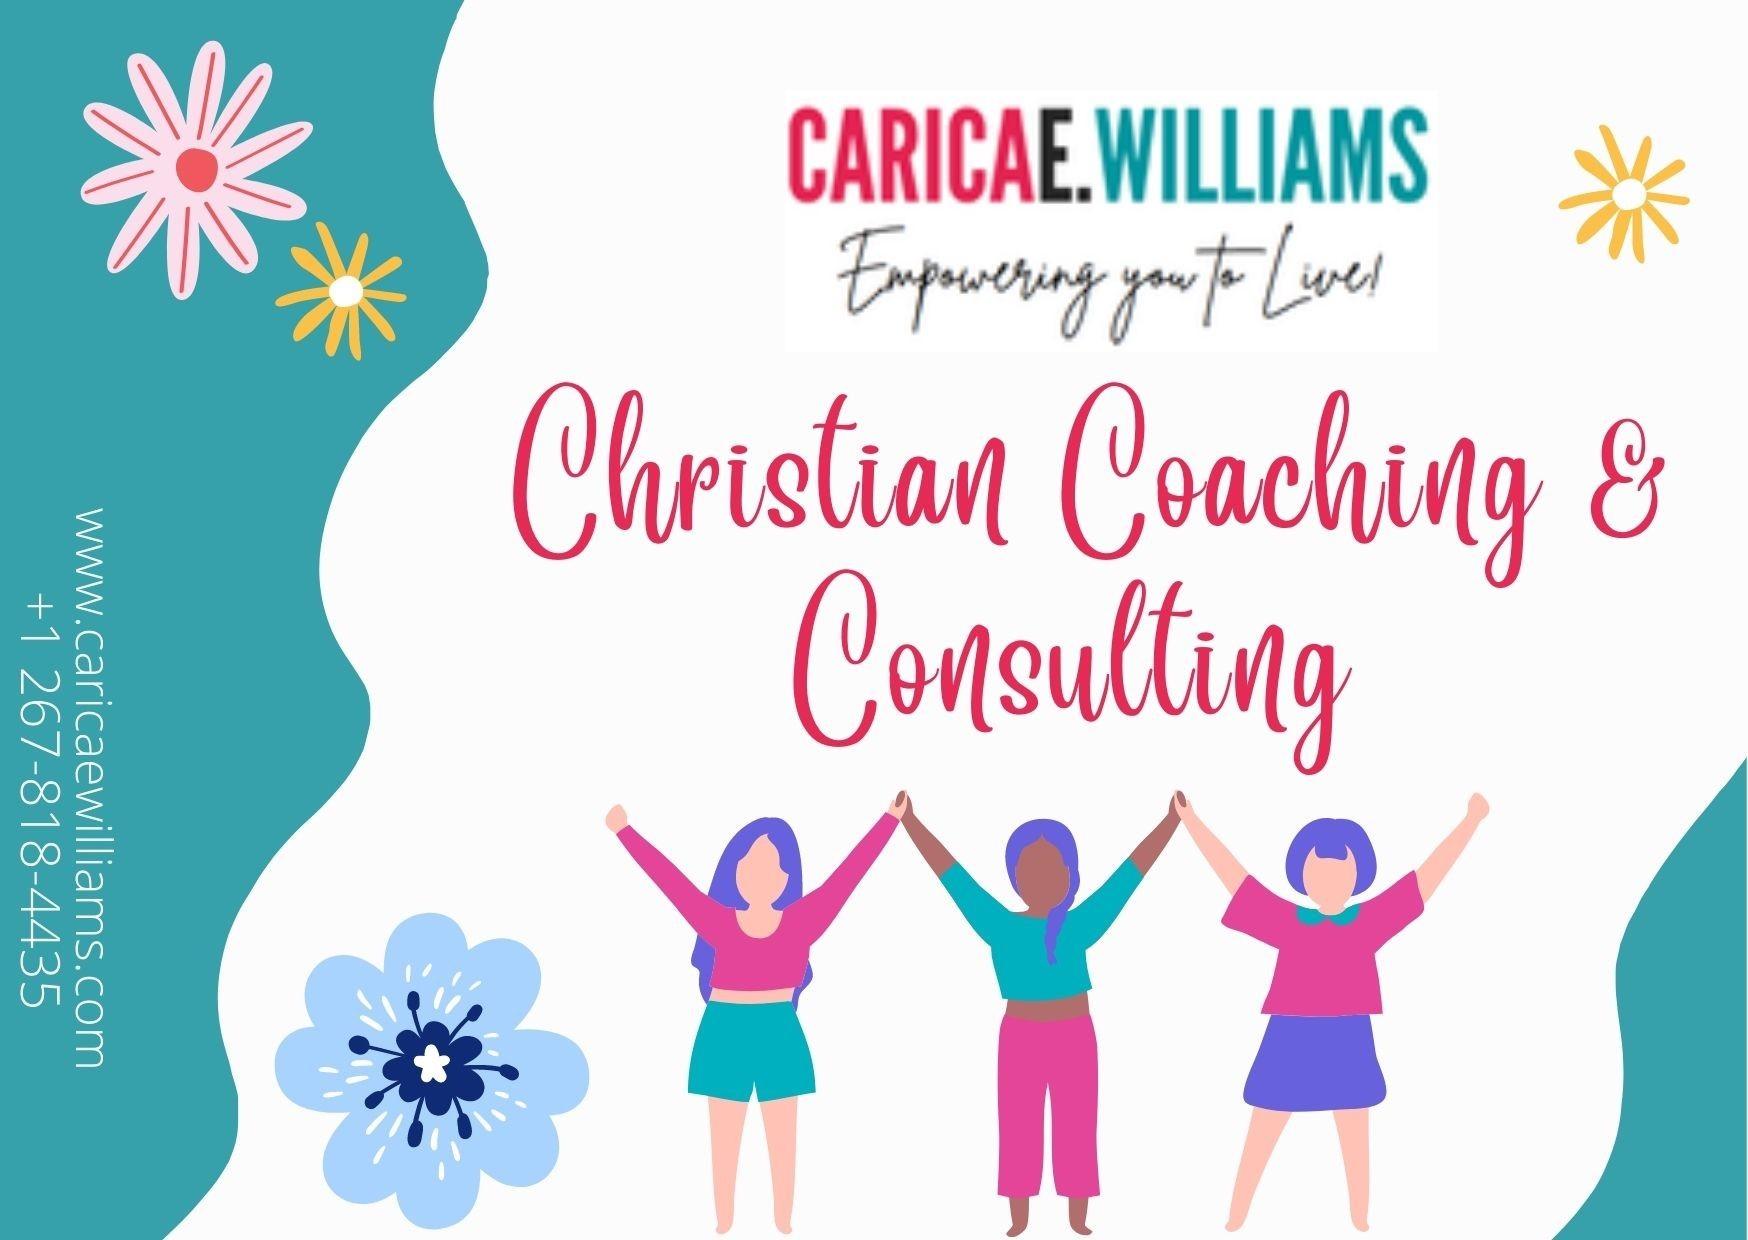 Christian Coaching & Consulting - Carica E. Williams